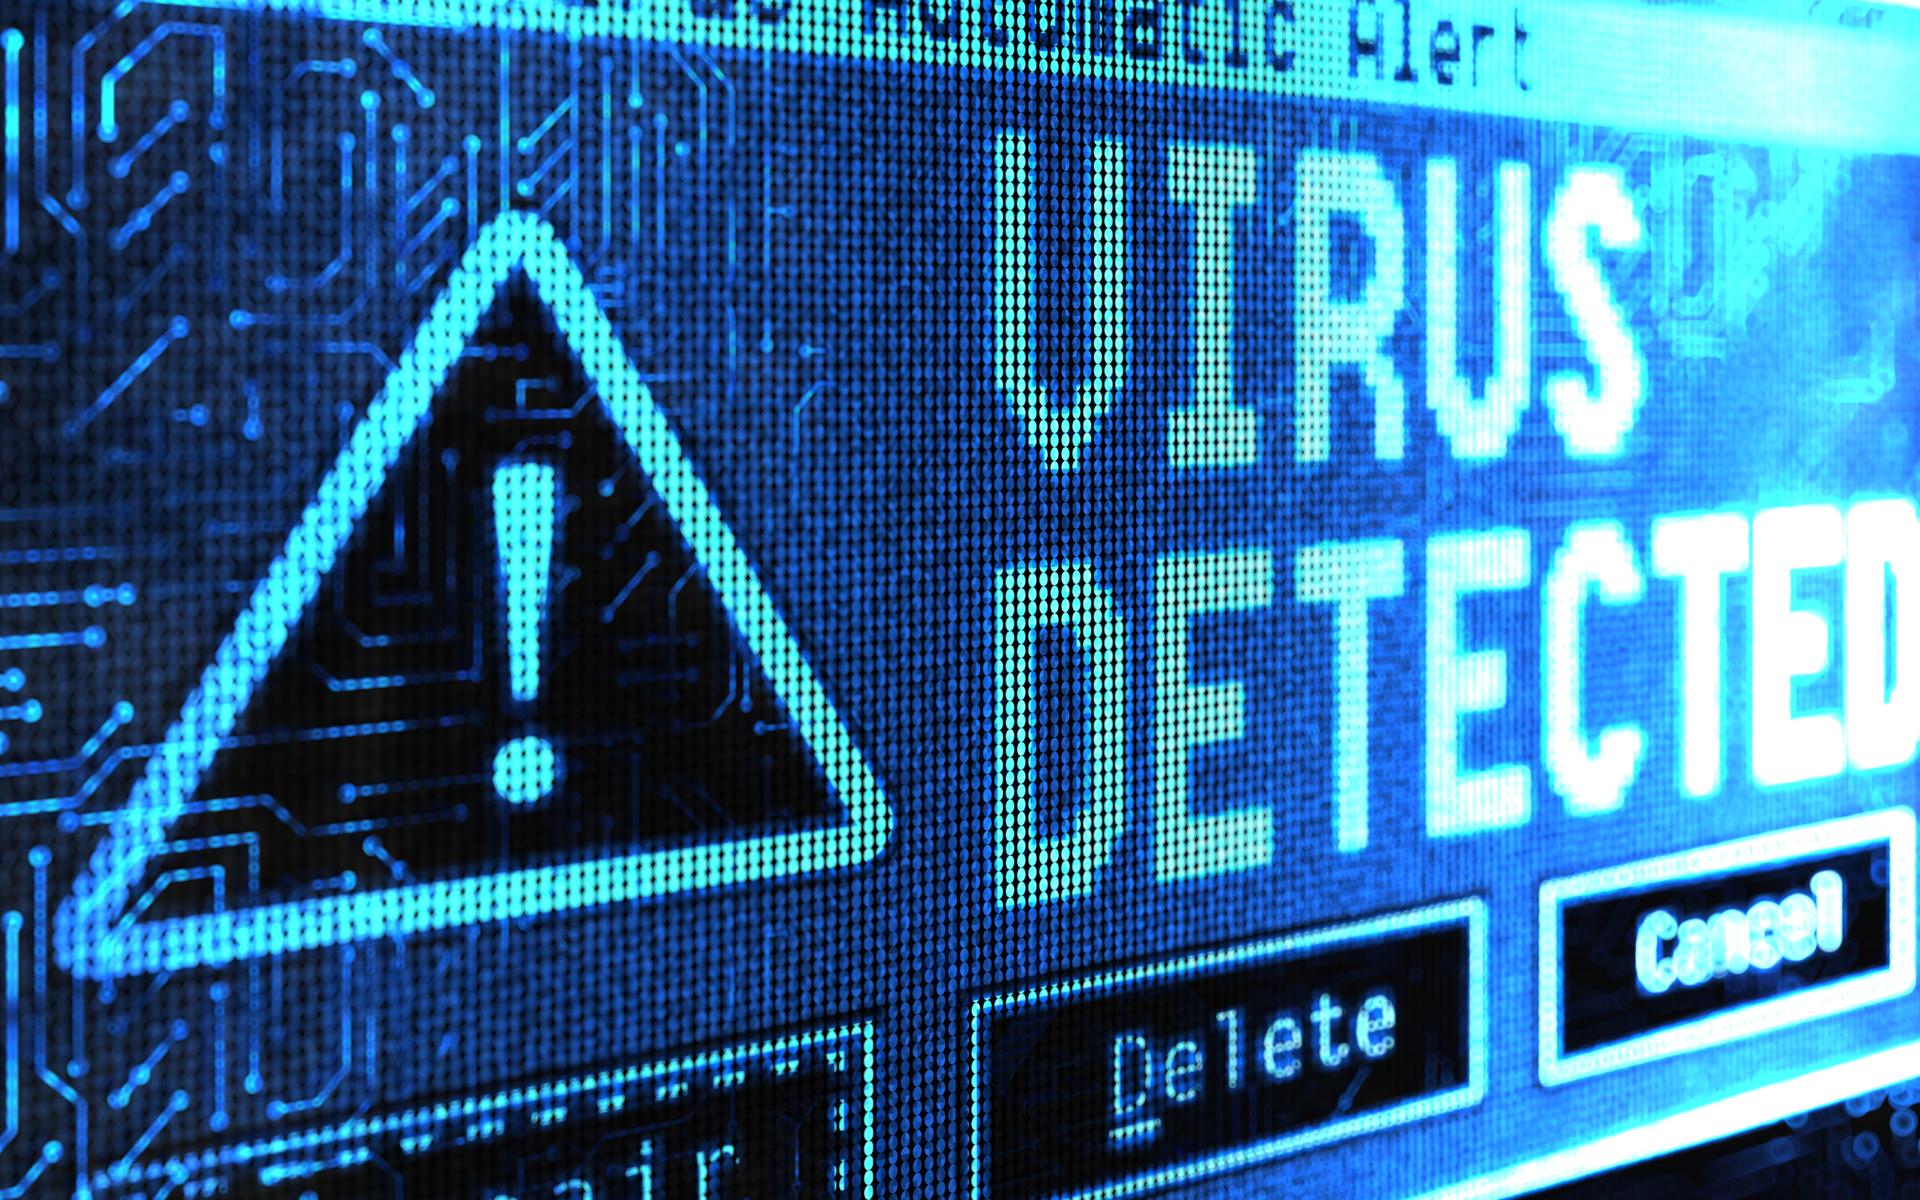 Microsoft windows malware removal image